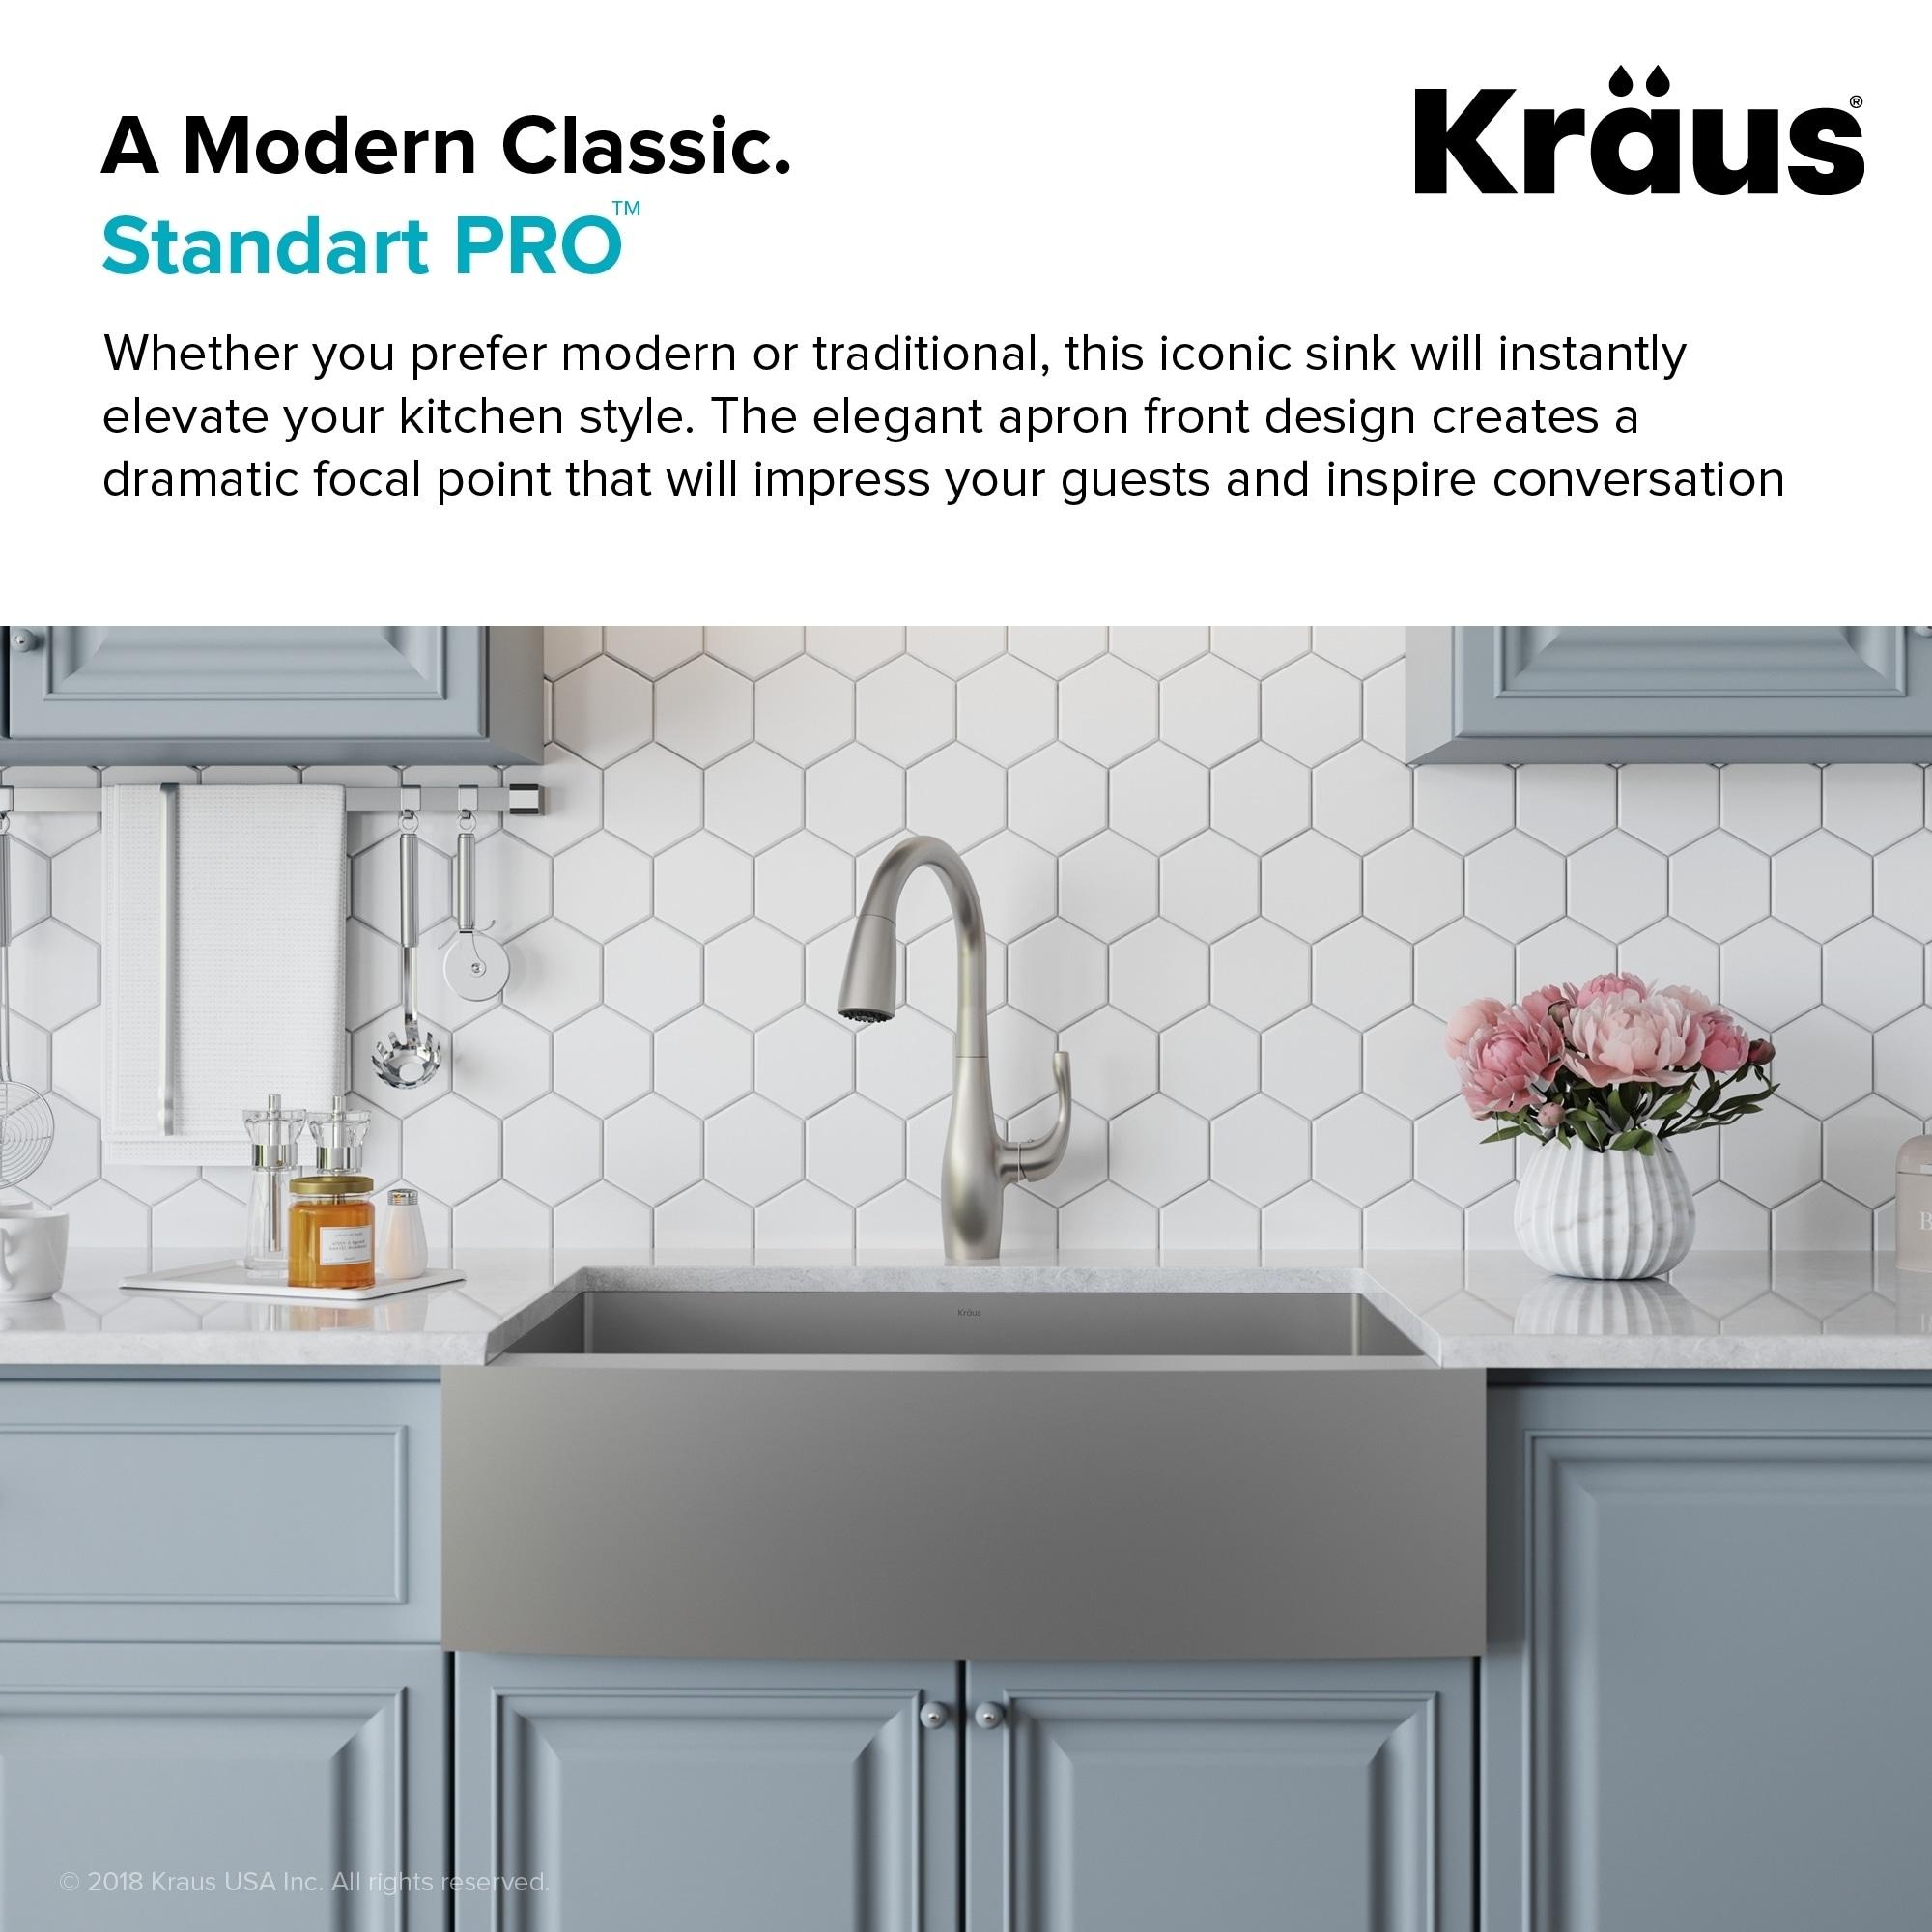 Shop Kraus KHF200-36 Standart PRO Farmhouse Apron 36-inch 16 gauge ...